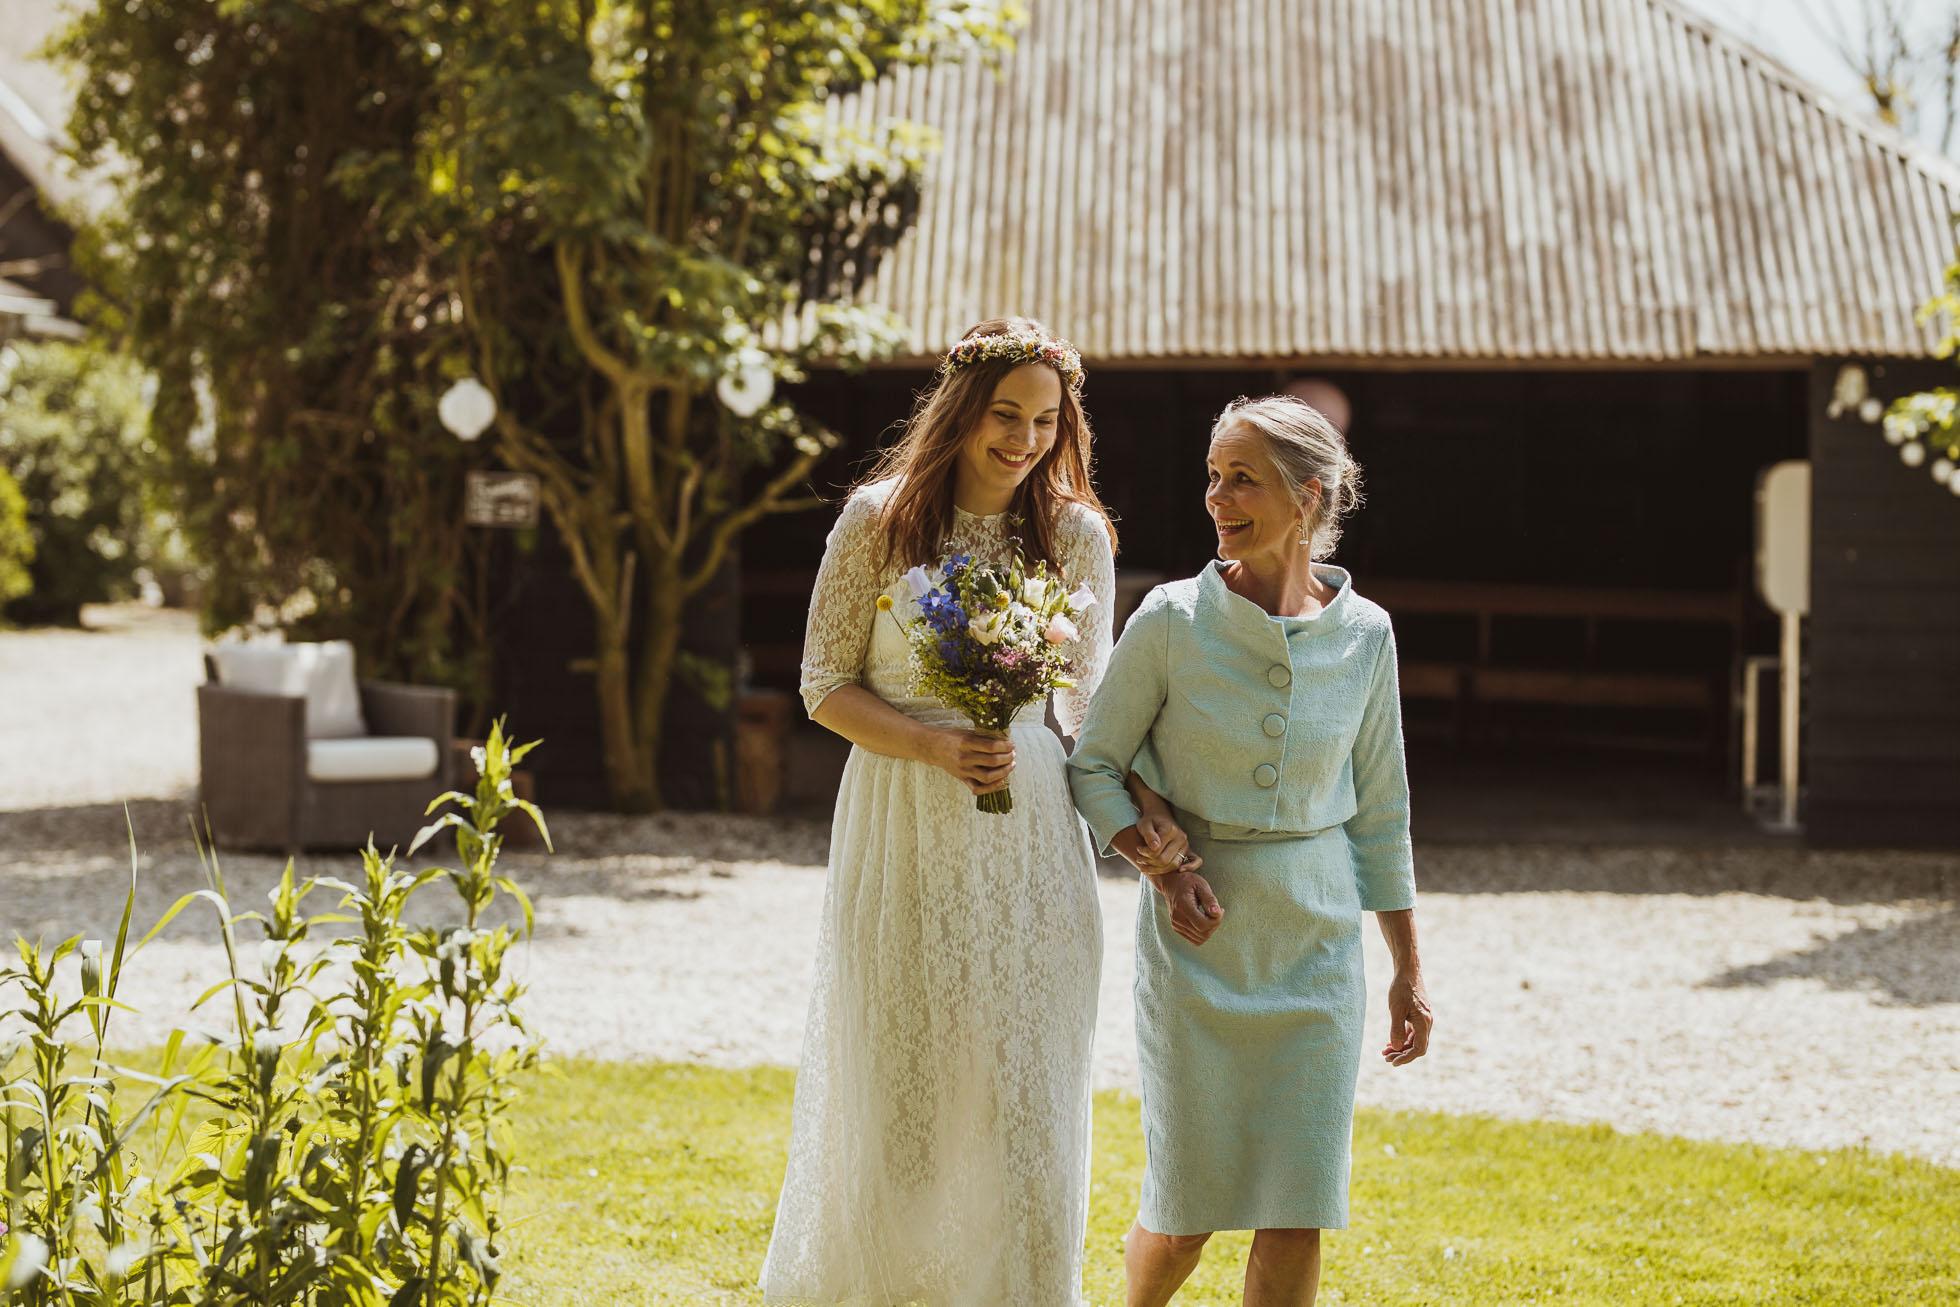 utrecht-wedding-photographer-63.jpg